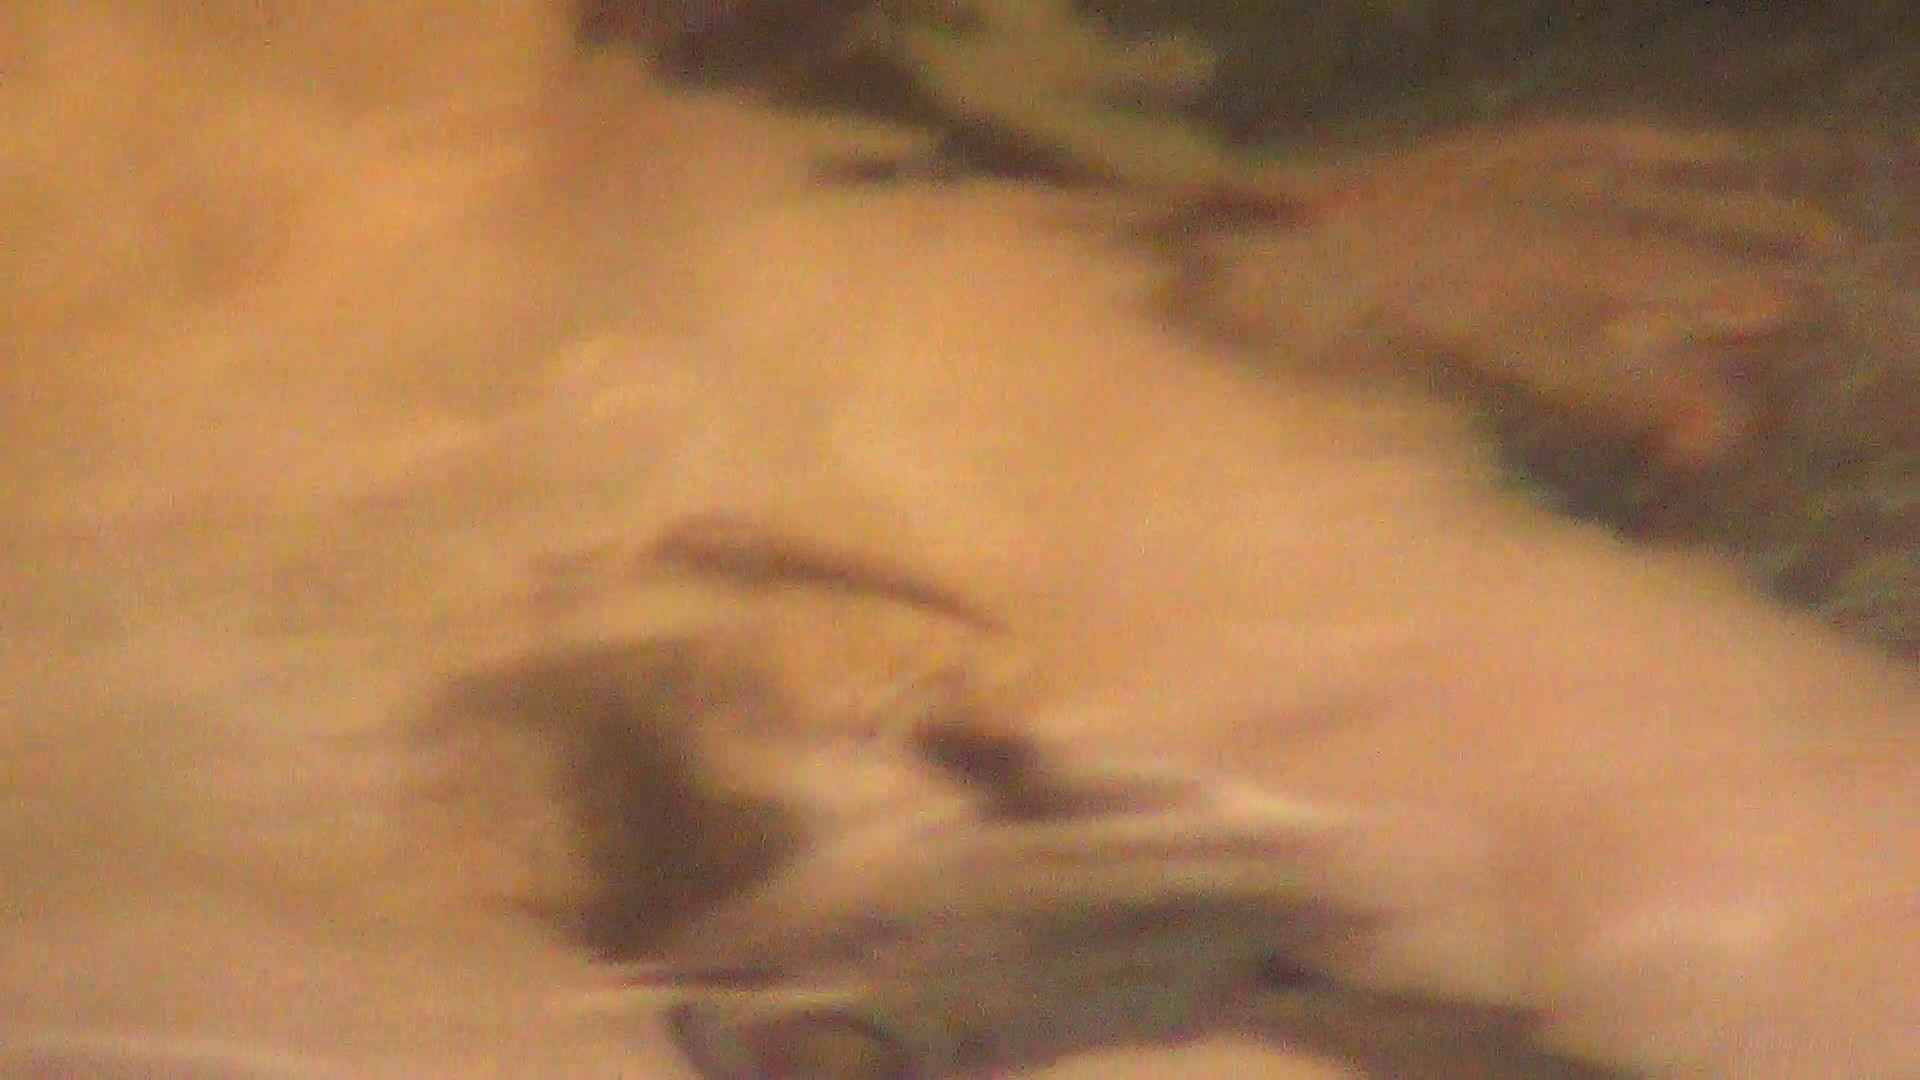 Vol.47 oyakoで登場 スレンダーだけどしっかりしたオッパイ 細身  64PIX 52